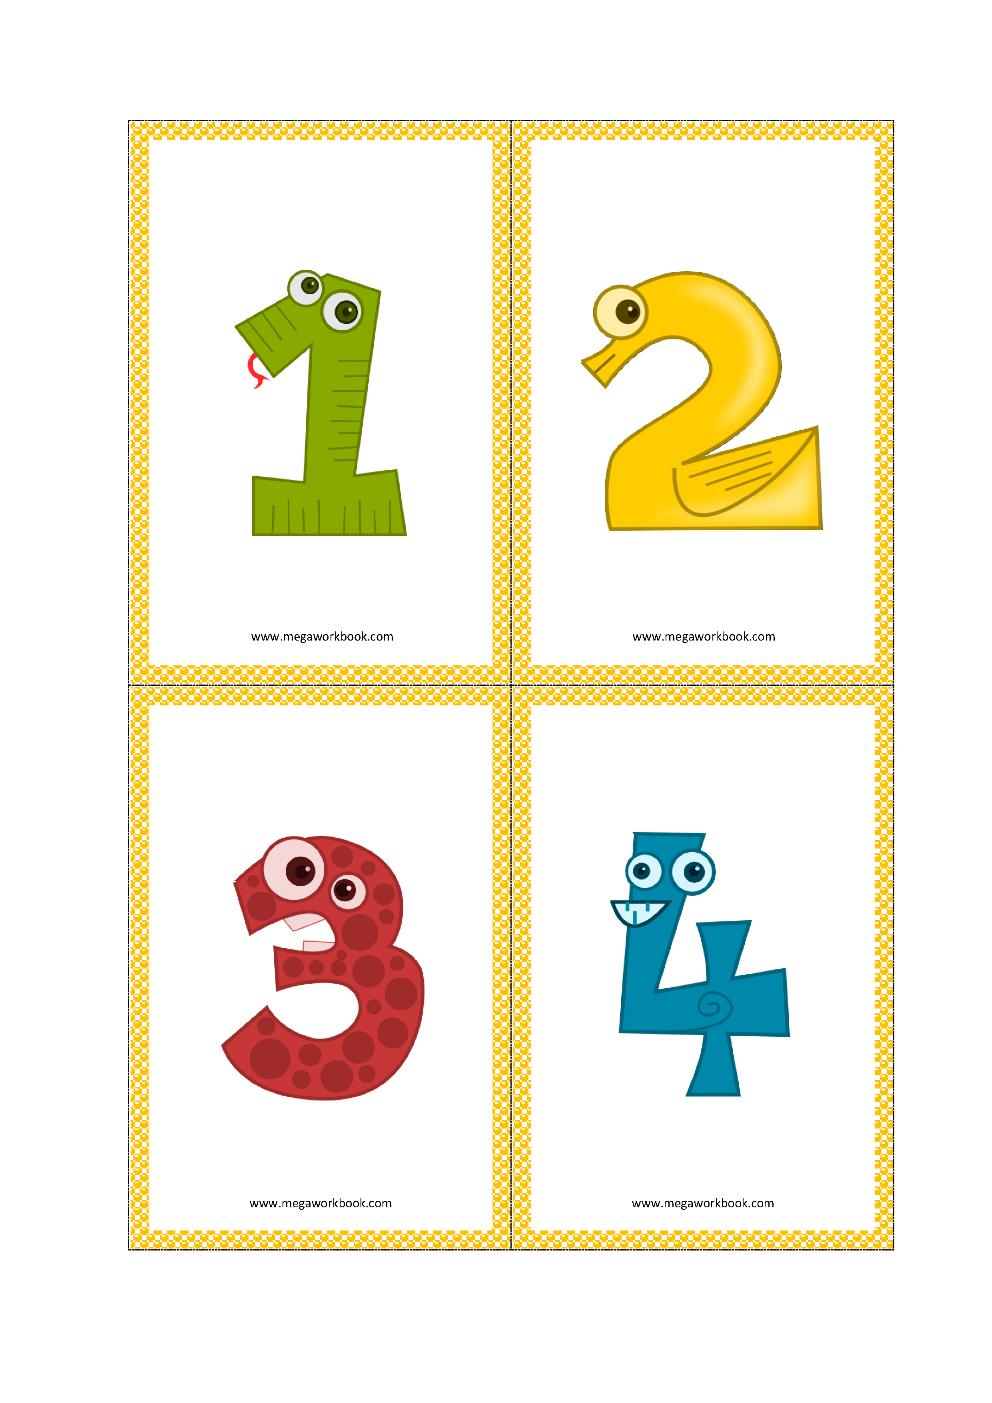 Number Flashcards Number Flashcards Printable Free 1 To 10 1 To 20 Megaworkbook